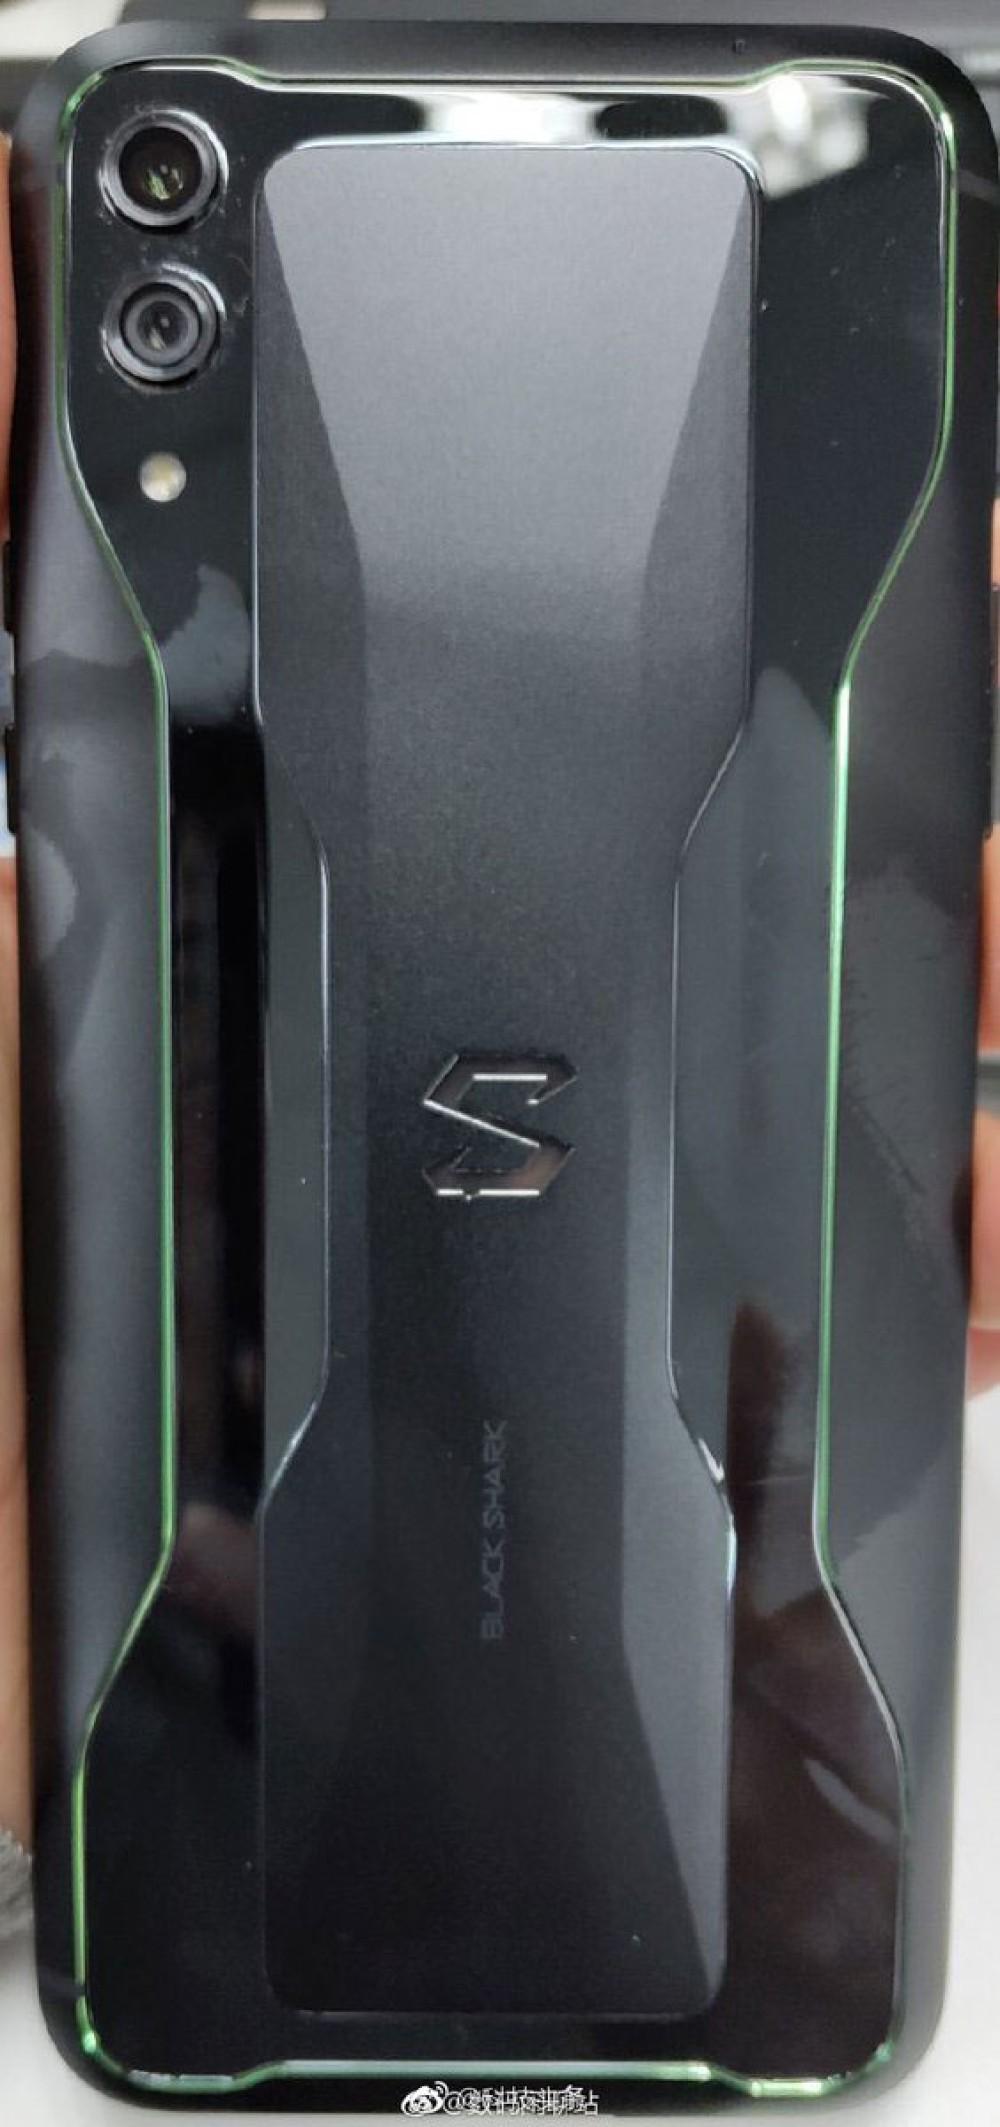 Xiaomi Black Shark 2: Διέρρευσε hands-on φωτογραφία του νέου gaming smartphone